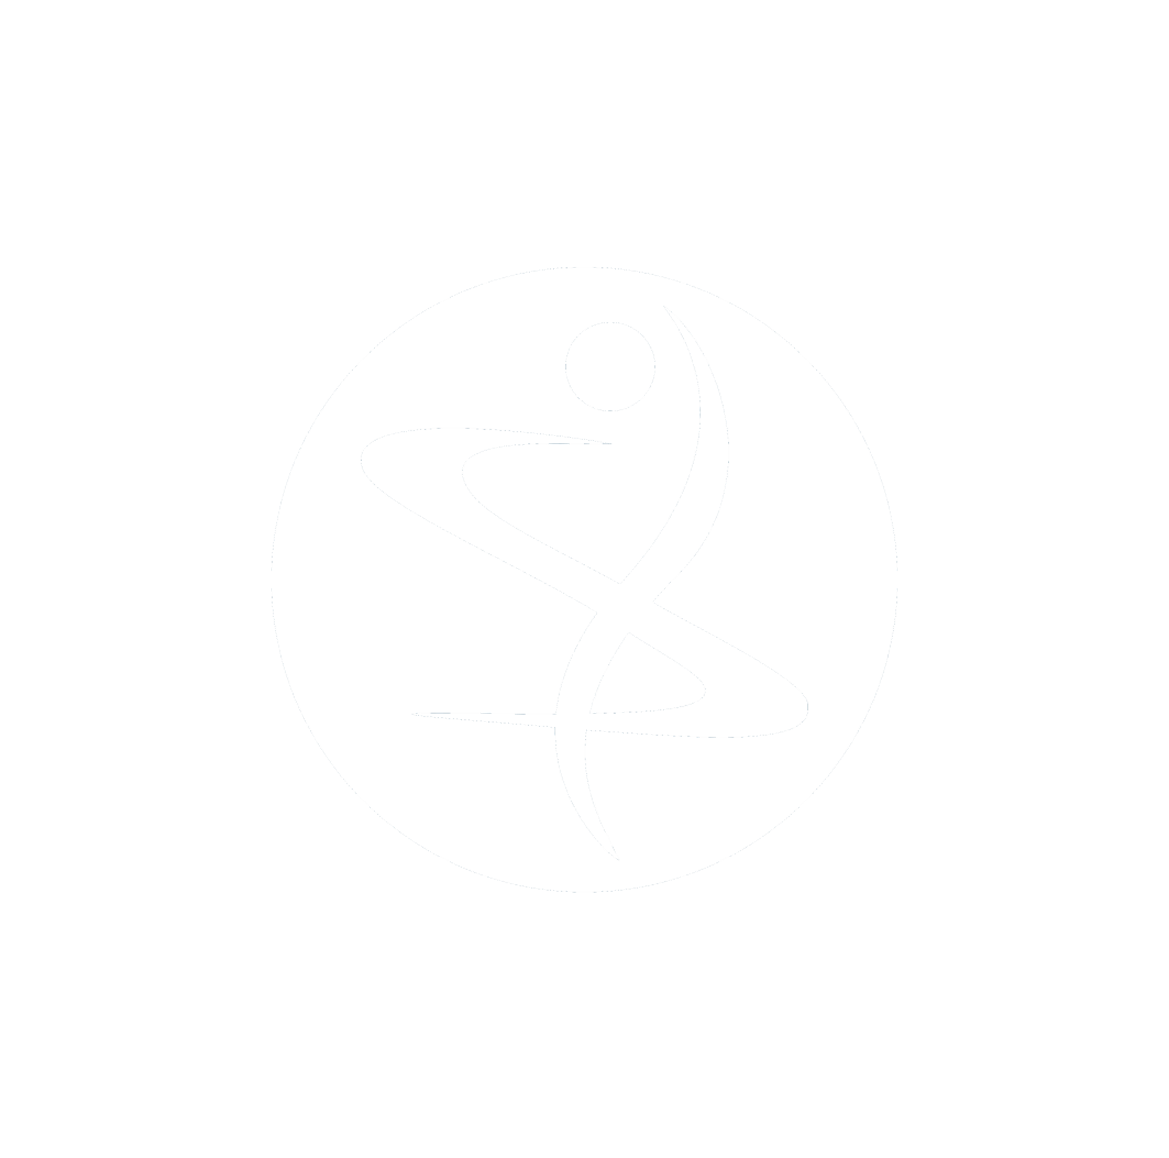 S•MED Schlaflabor Recklinghausen Logo